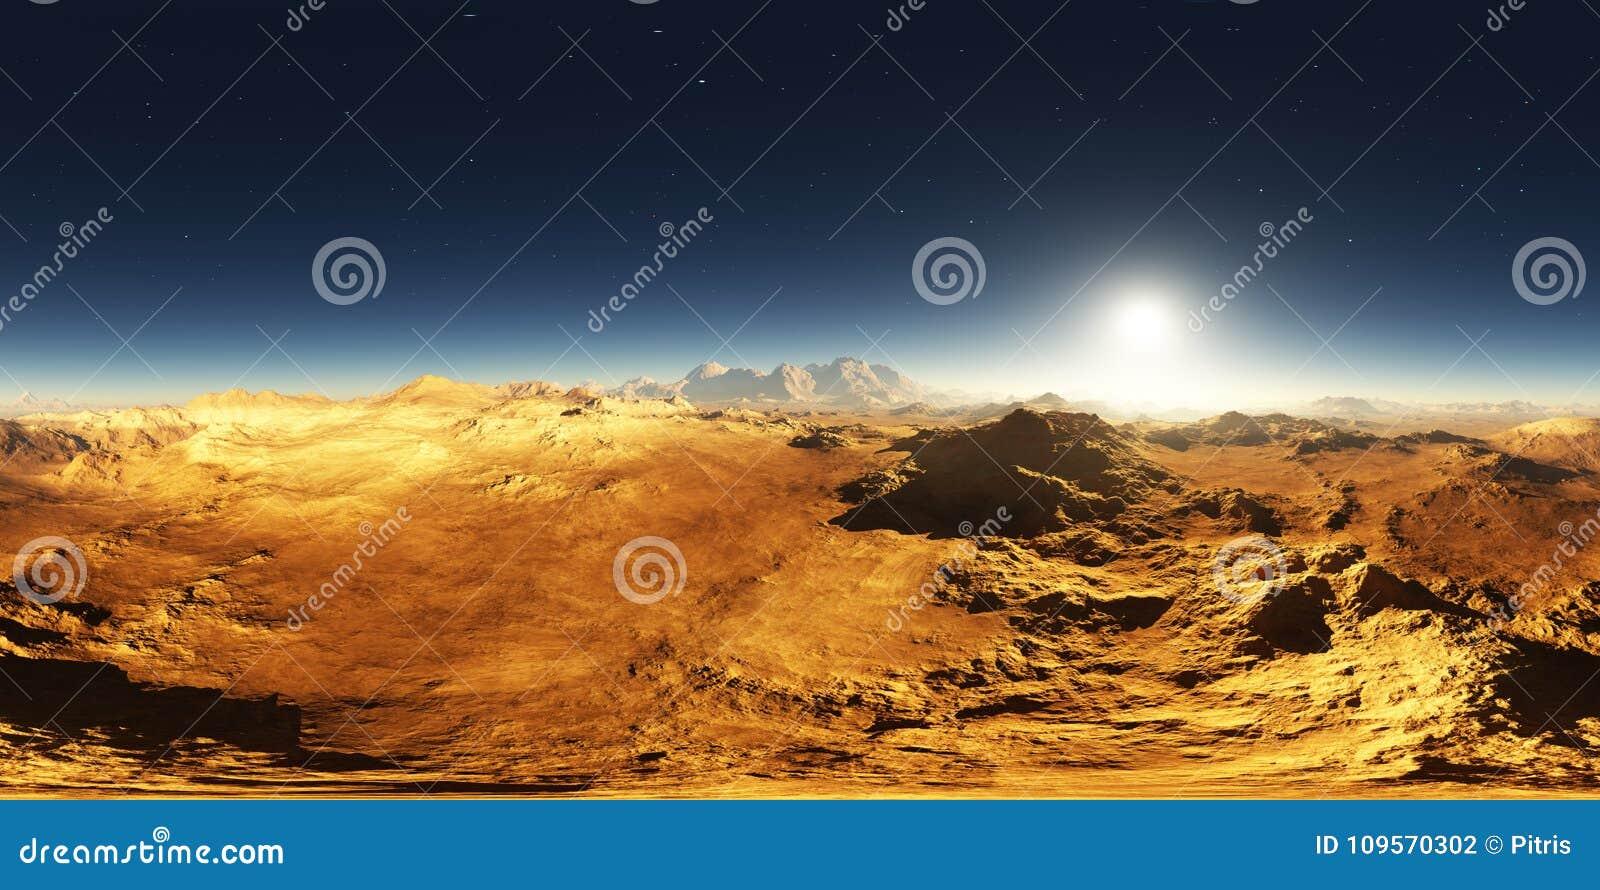 Panorama von Mars-Sonnenuntergang Marslandschaft, Karte der Umwelt 360 HDRI Equirectangular-Projektion, kugelförmiges Panorama